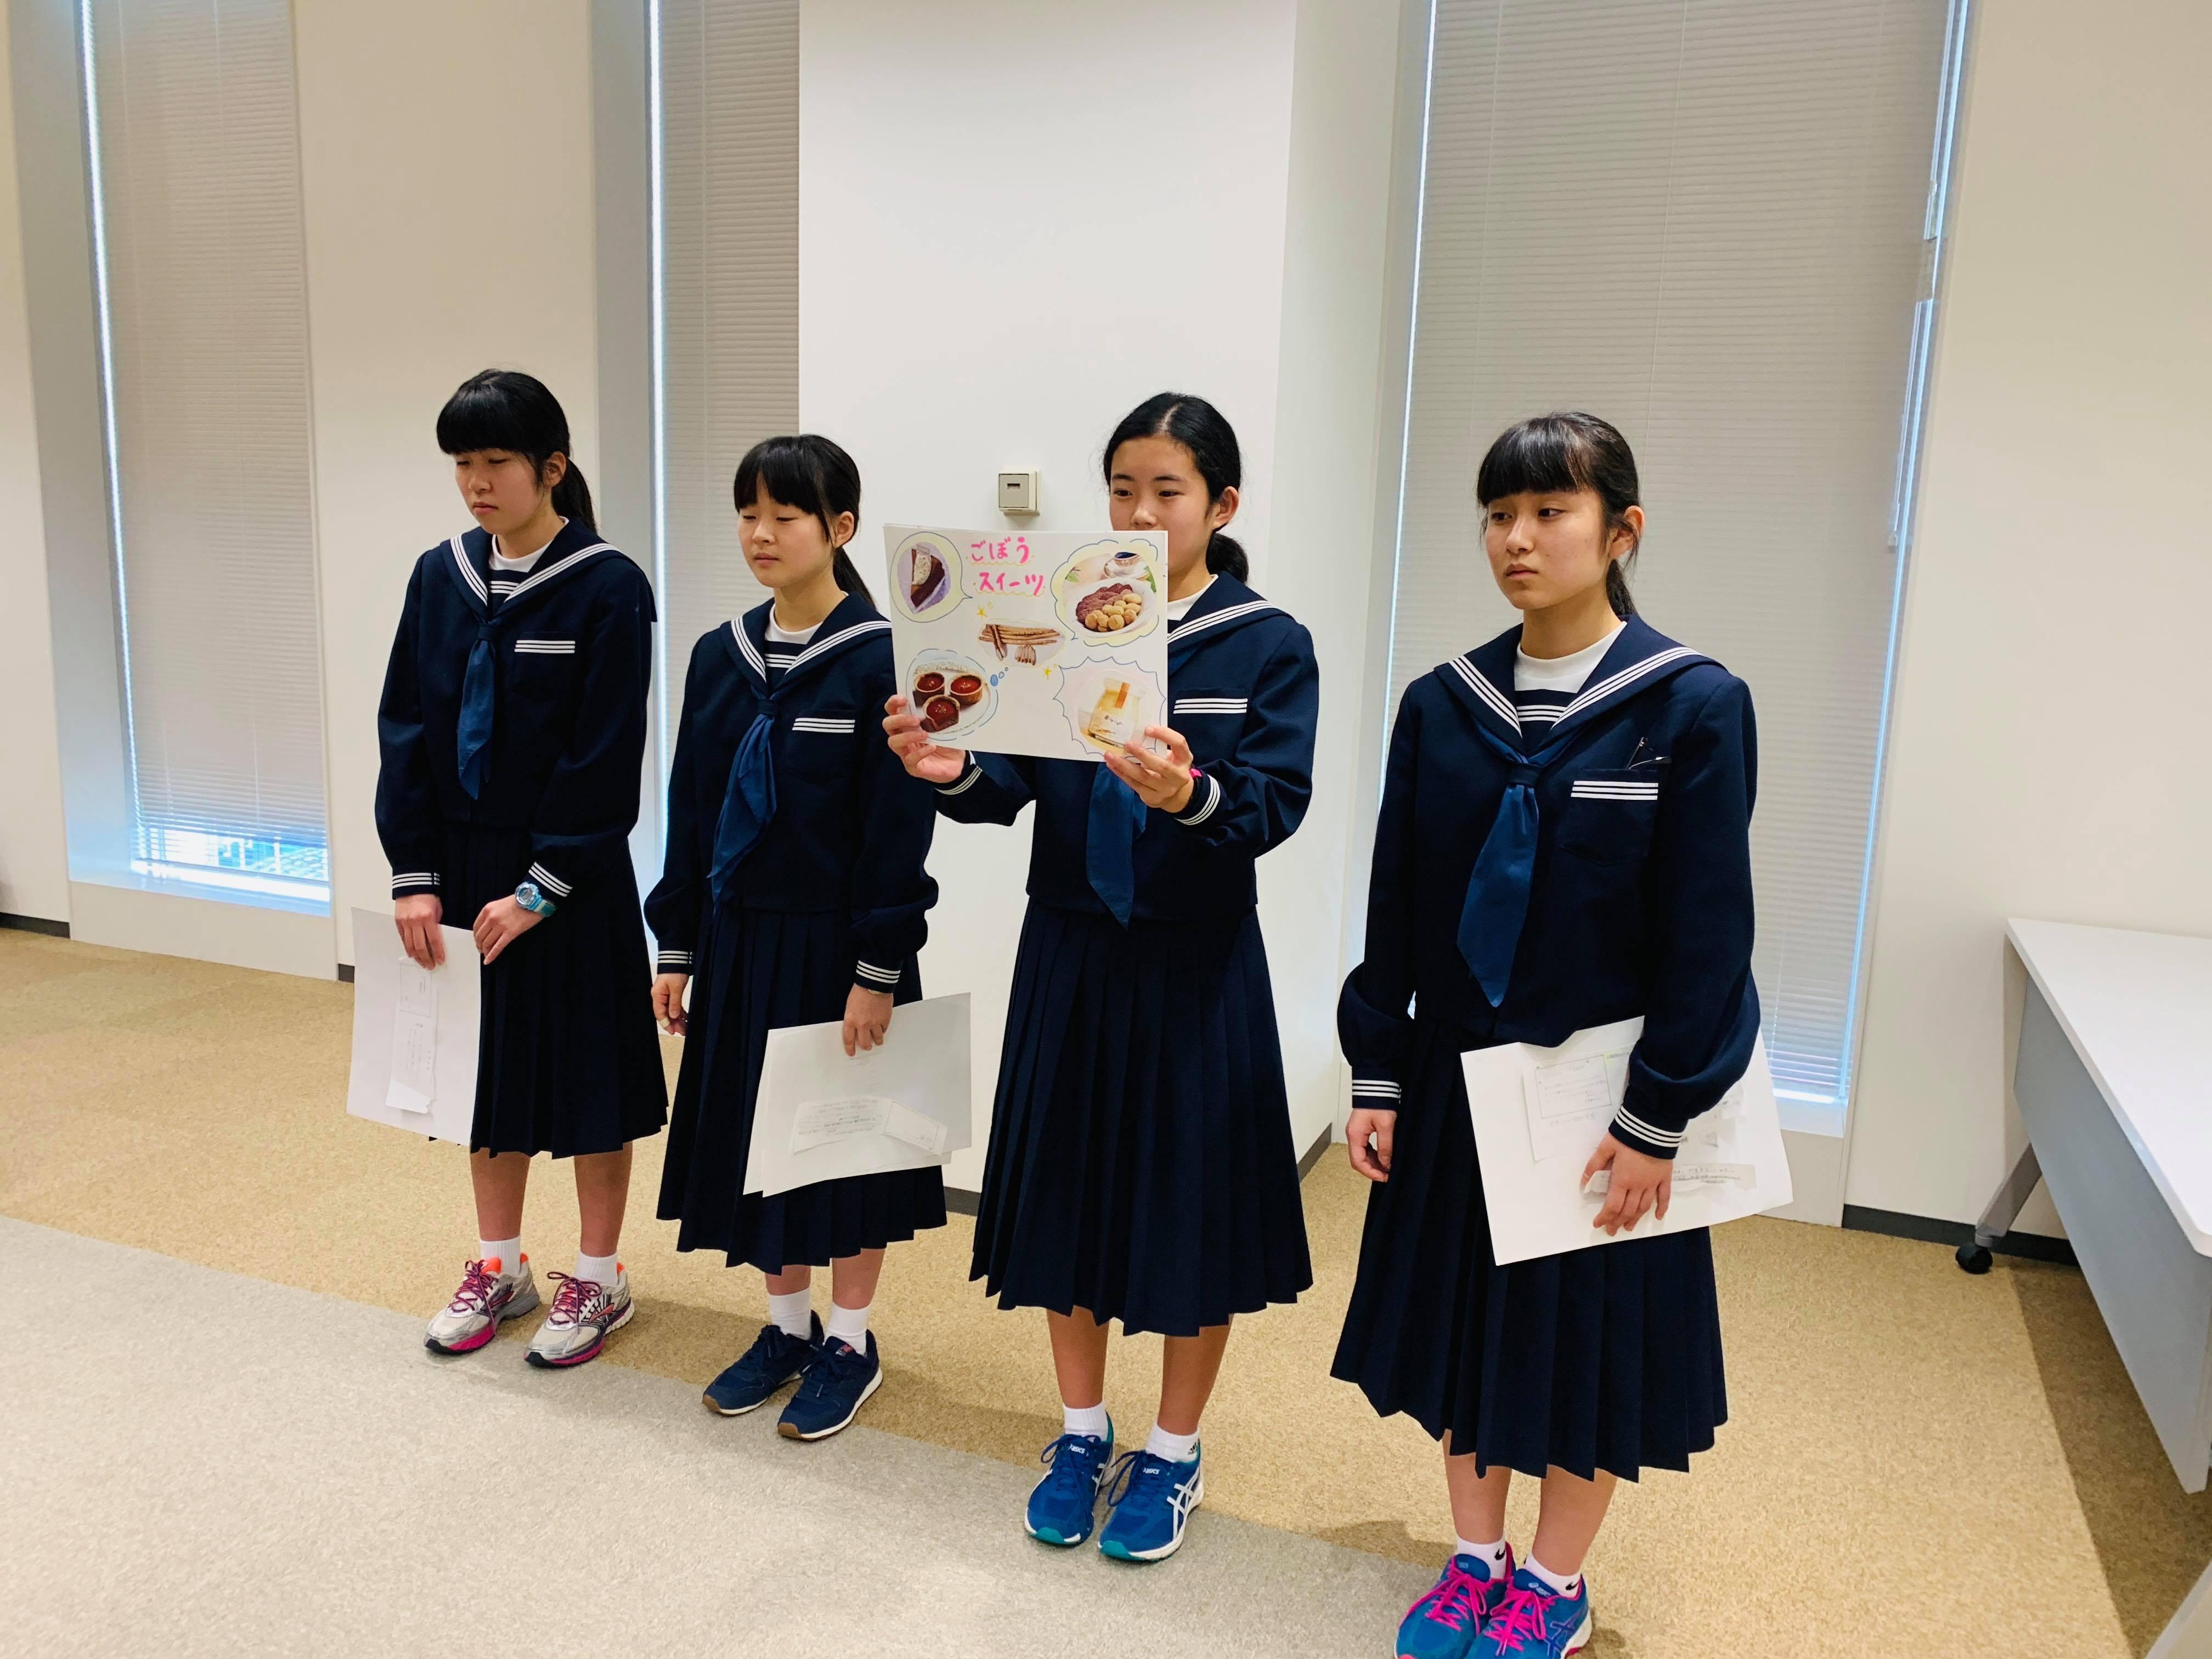 45661013 1459576110843674 2026935297664614400 n - 2018年11月7日青森県東北中学校AFS(AOsukiフューチャーズゼミ)開催しました。